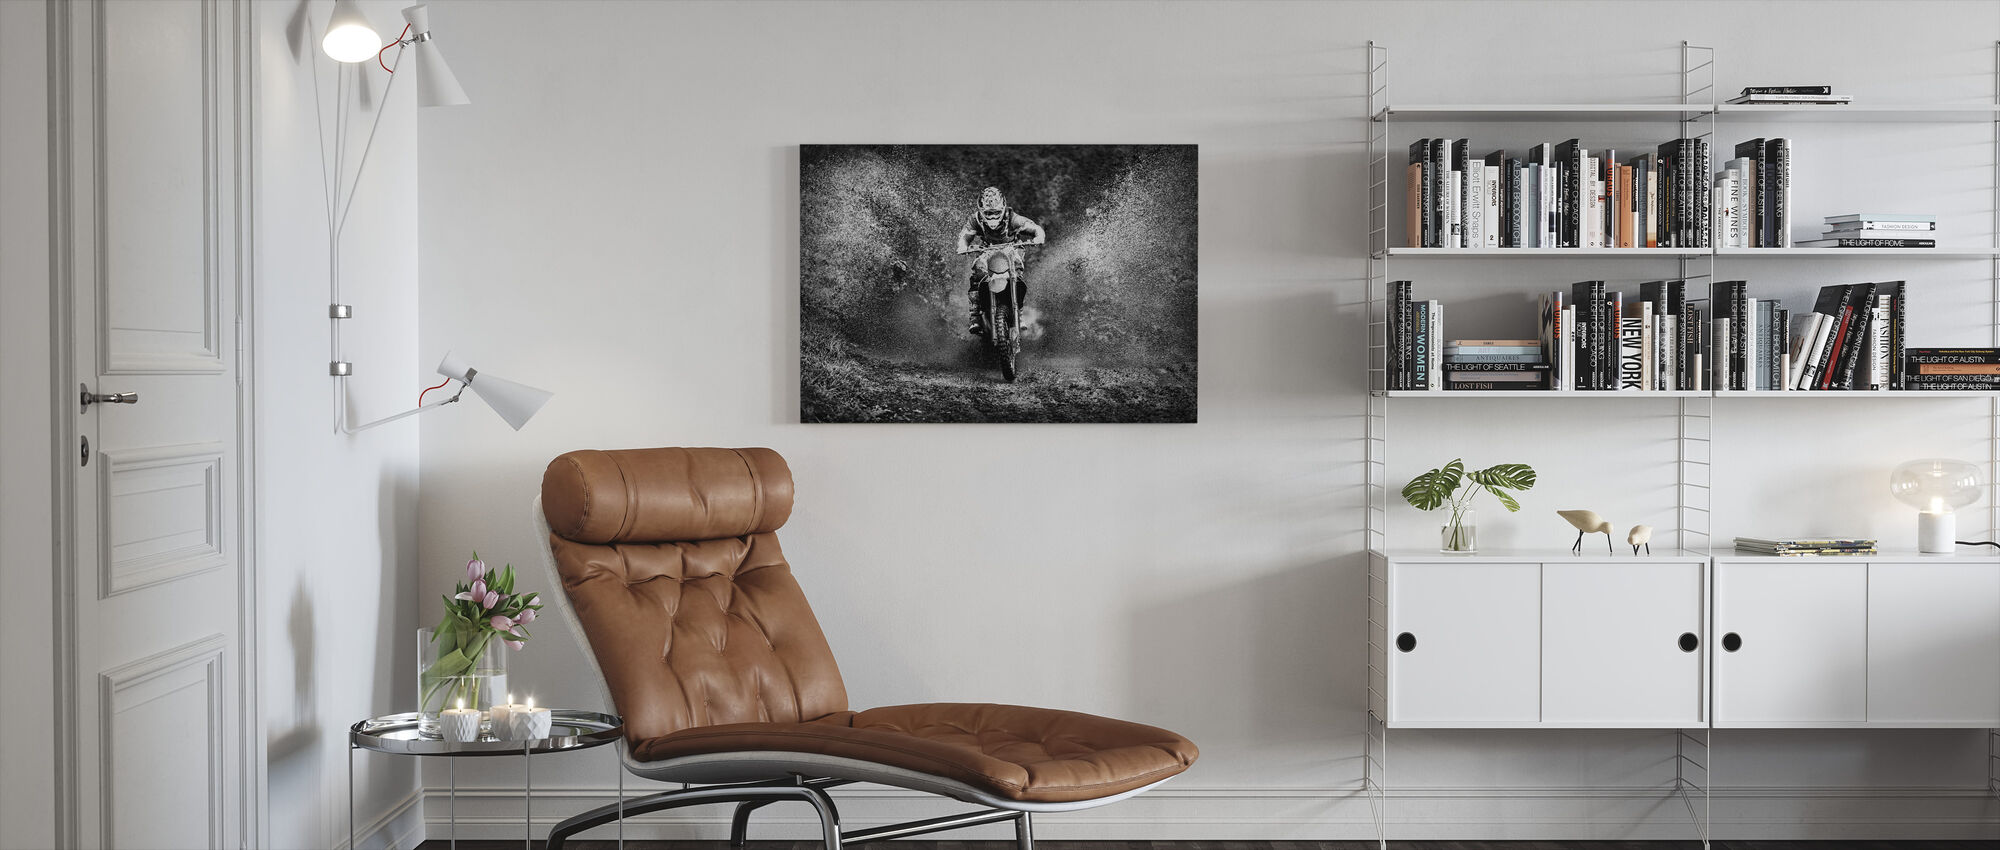 Spray Mud Motorfiets, zwart en wit - Canvas print - Woonkamer